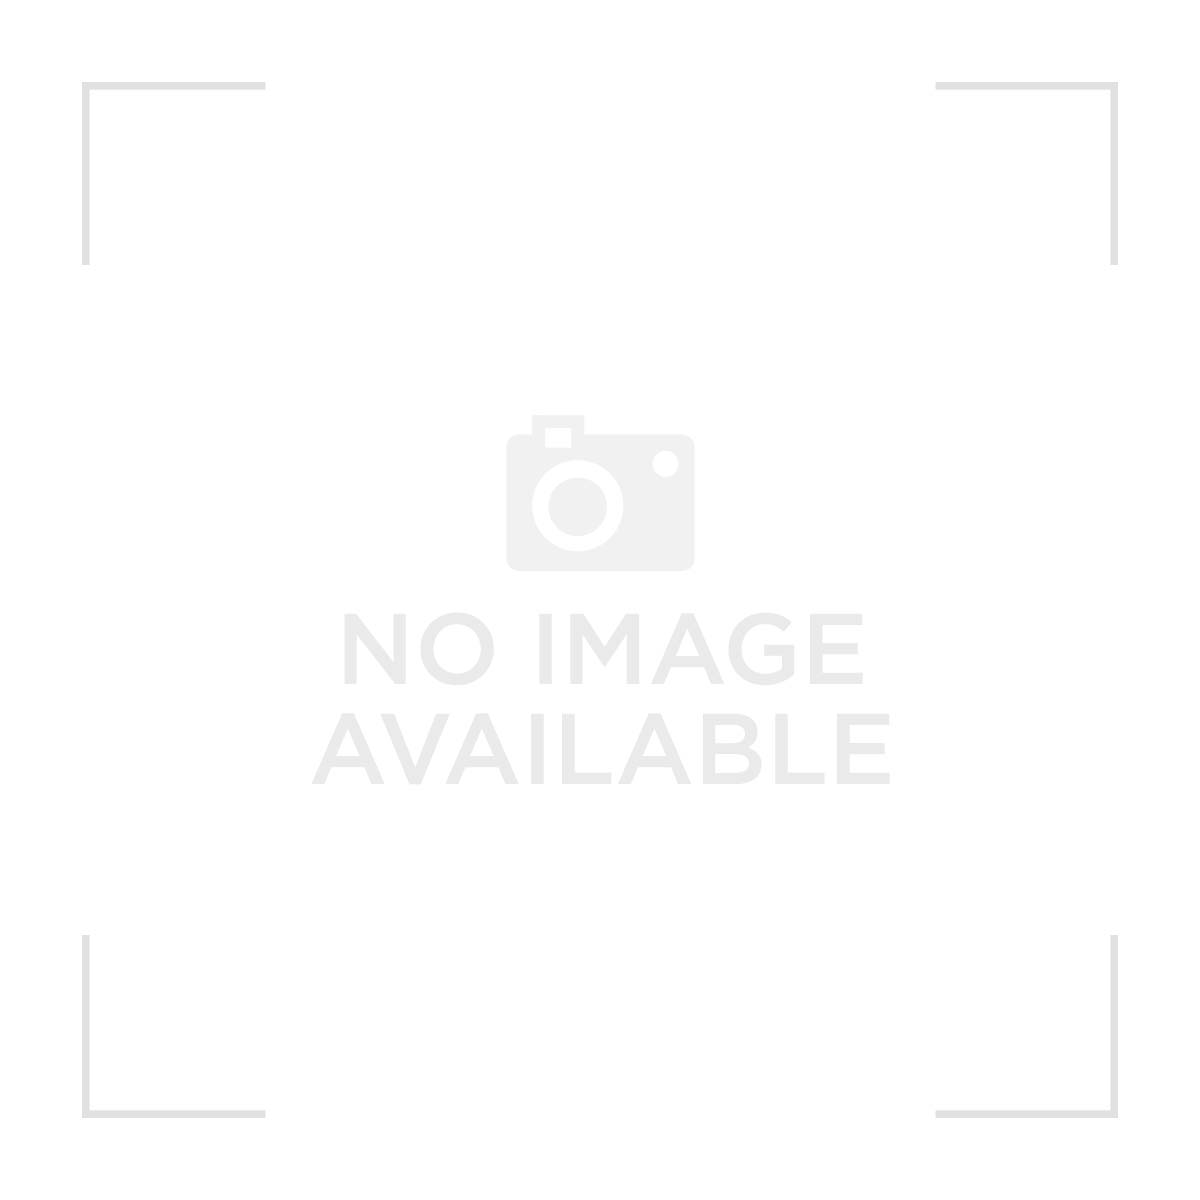 Taleggio Arnoldi 0.25 - 0.3 lb Piece